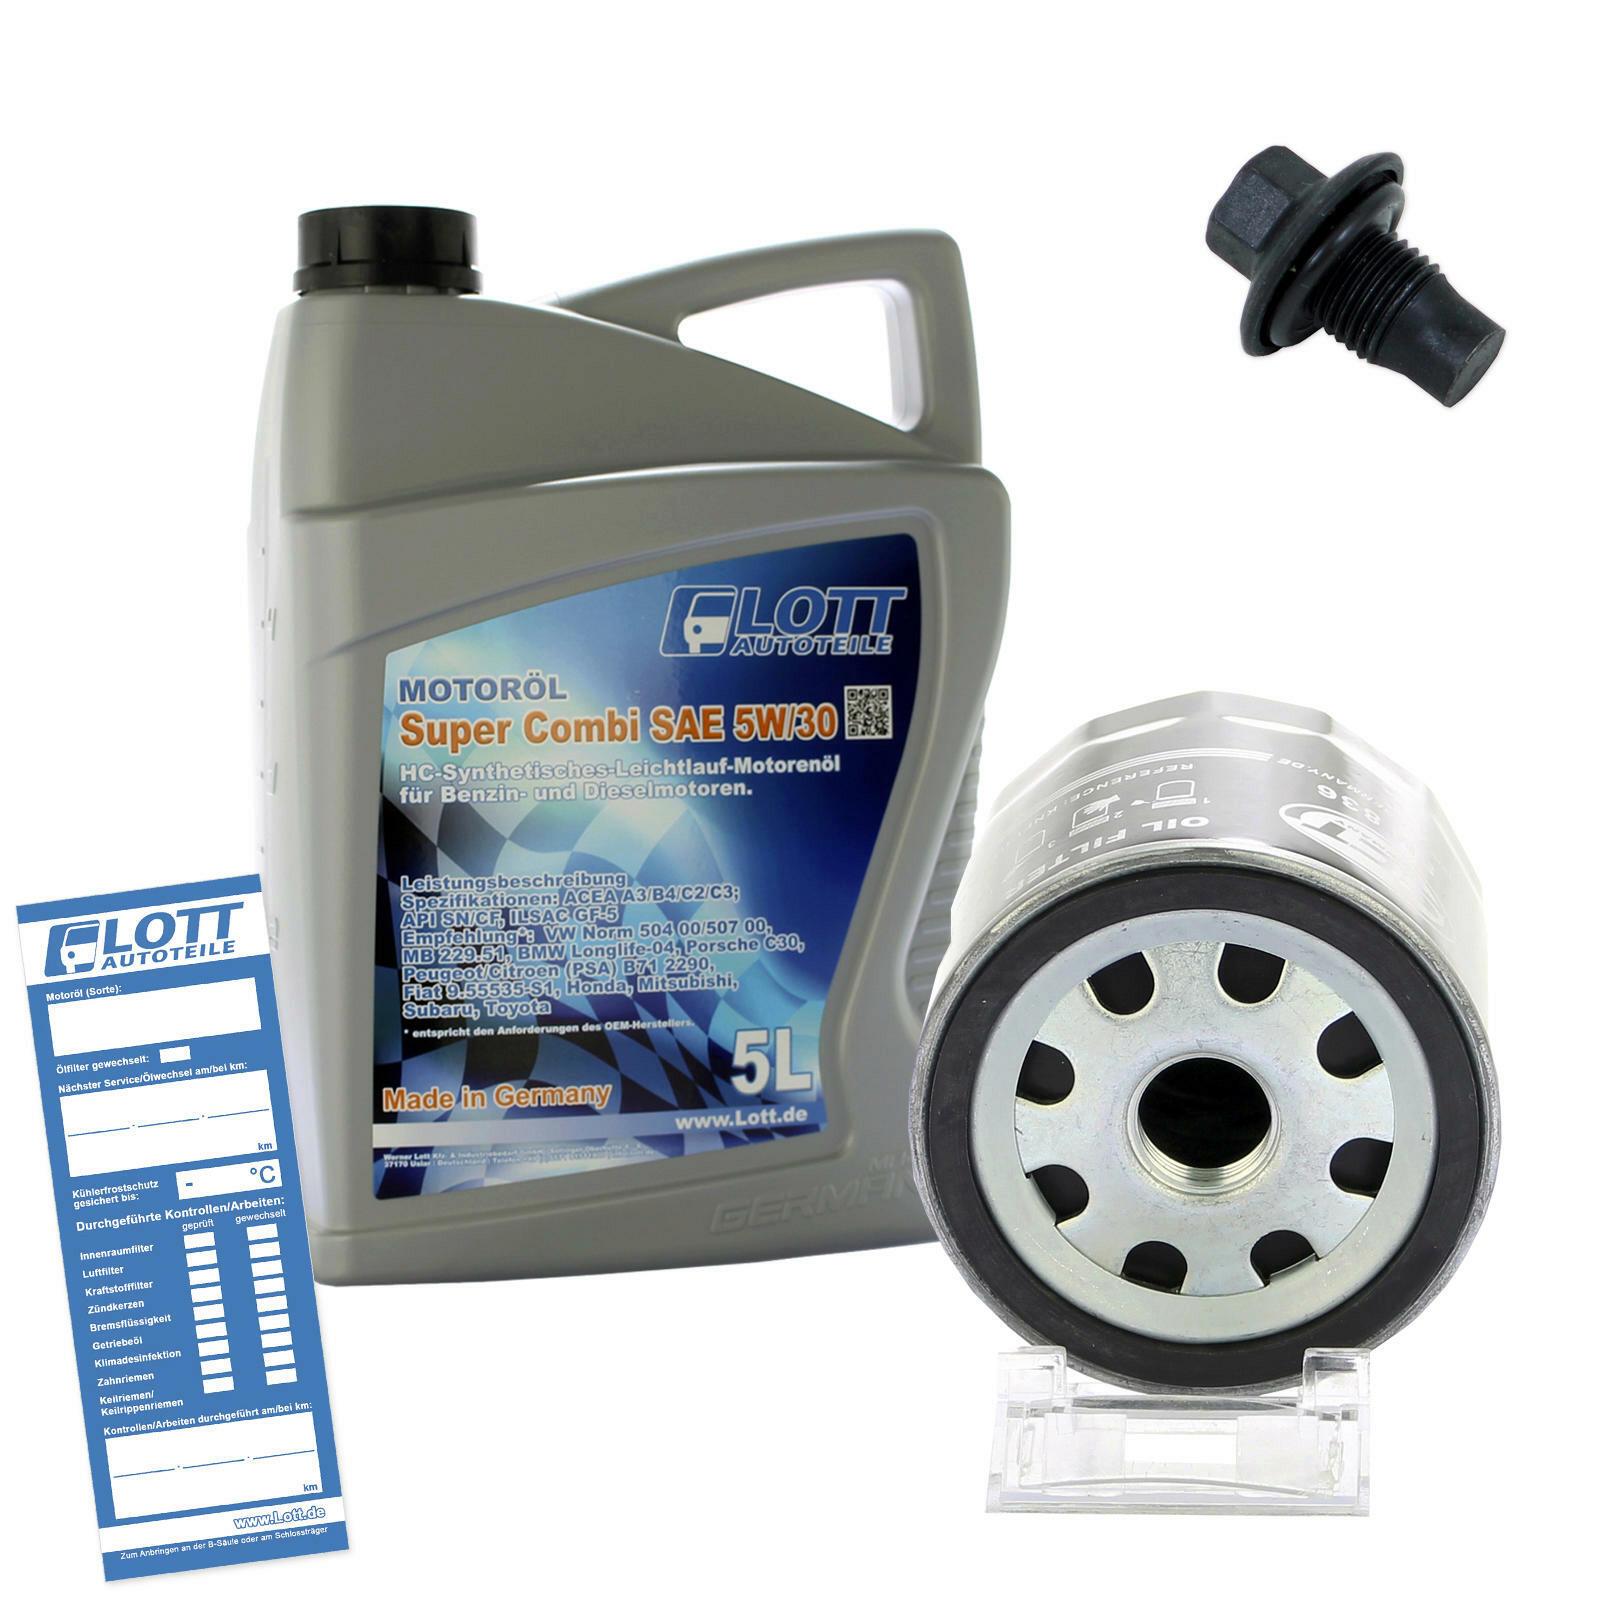 Ölwechsel Set Ölfilter + Lott Motoröl + Ablassschraube